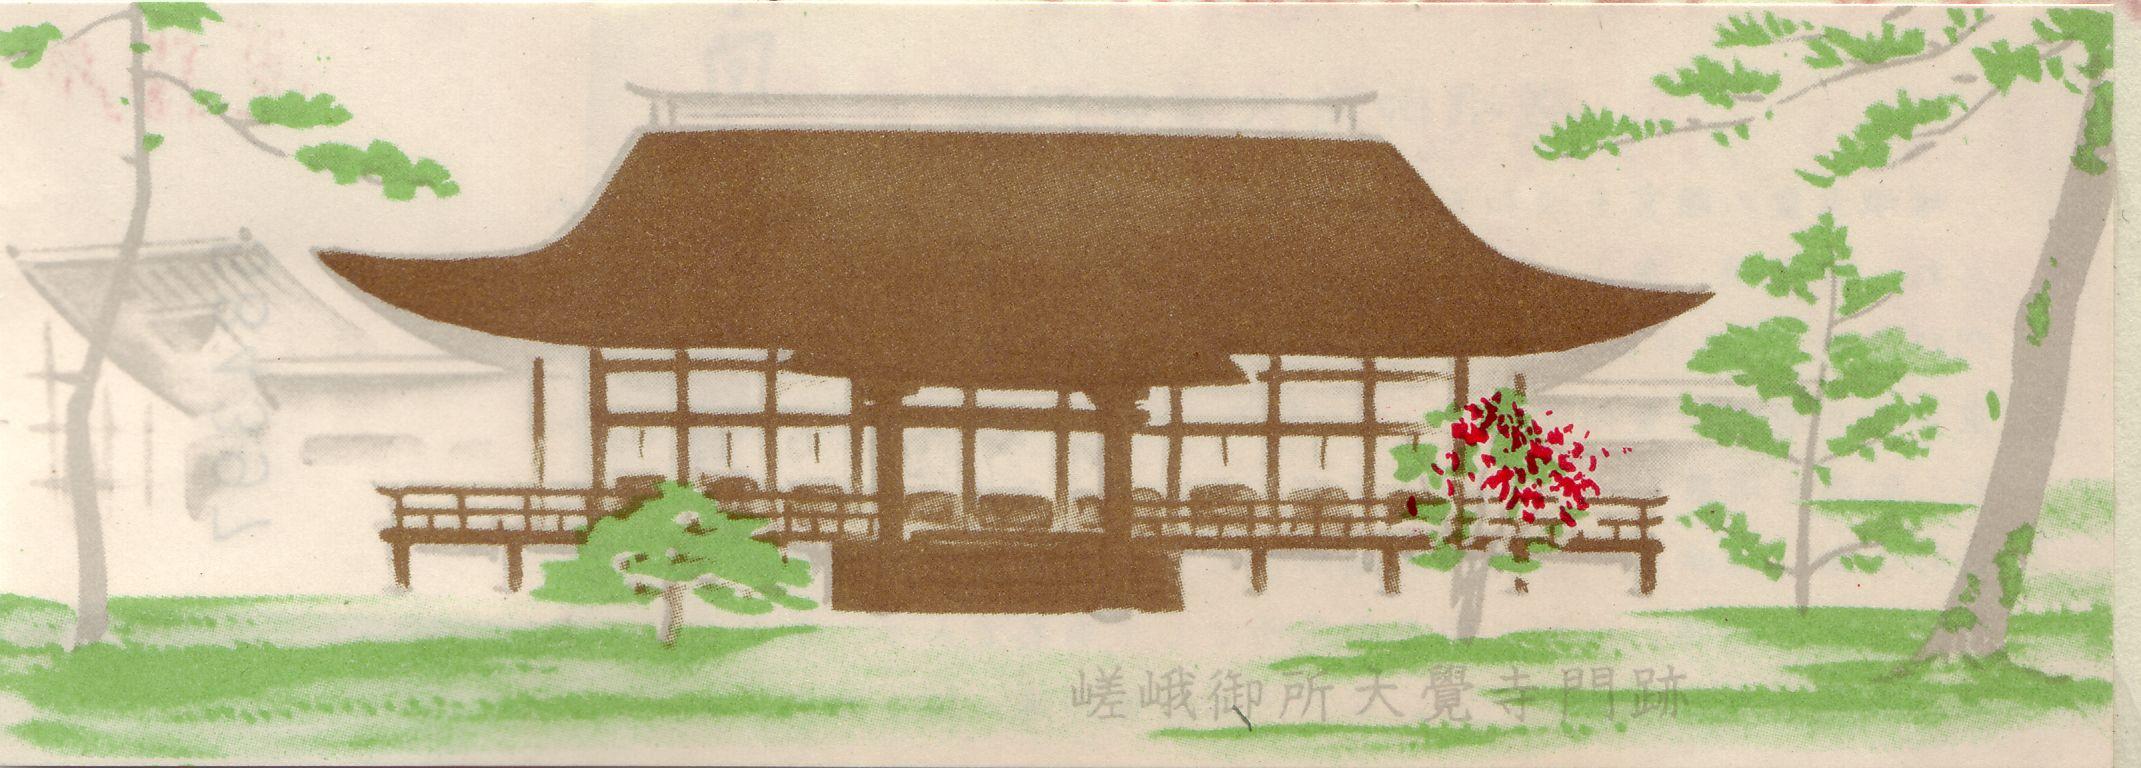 大覚寺の拝観券